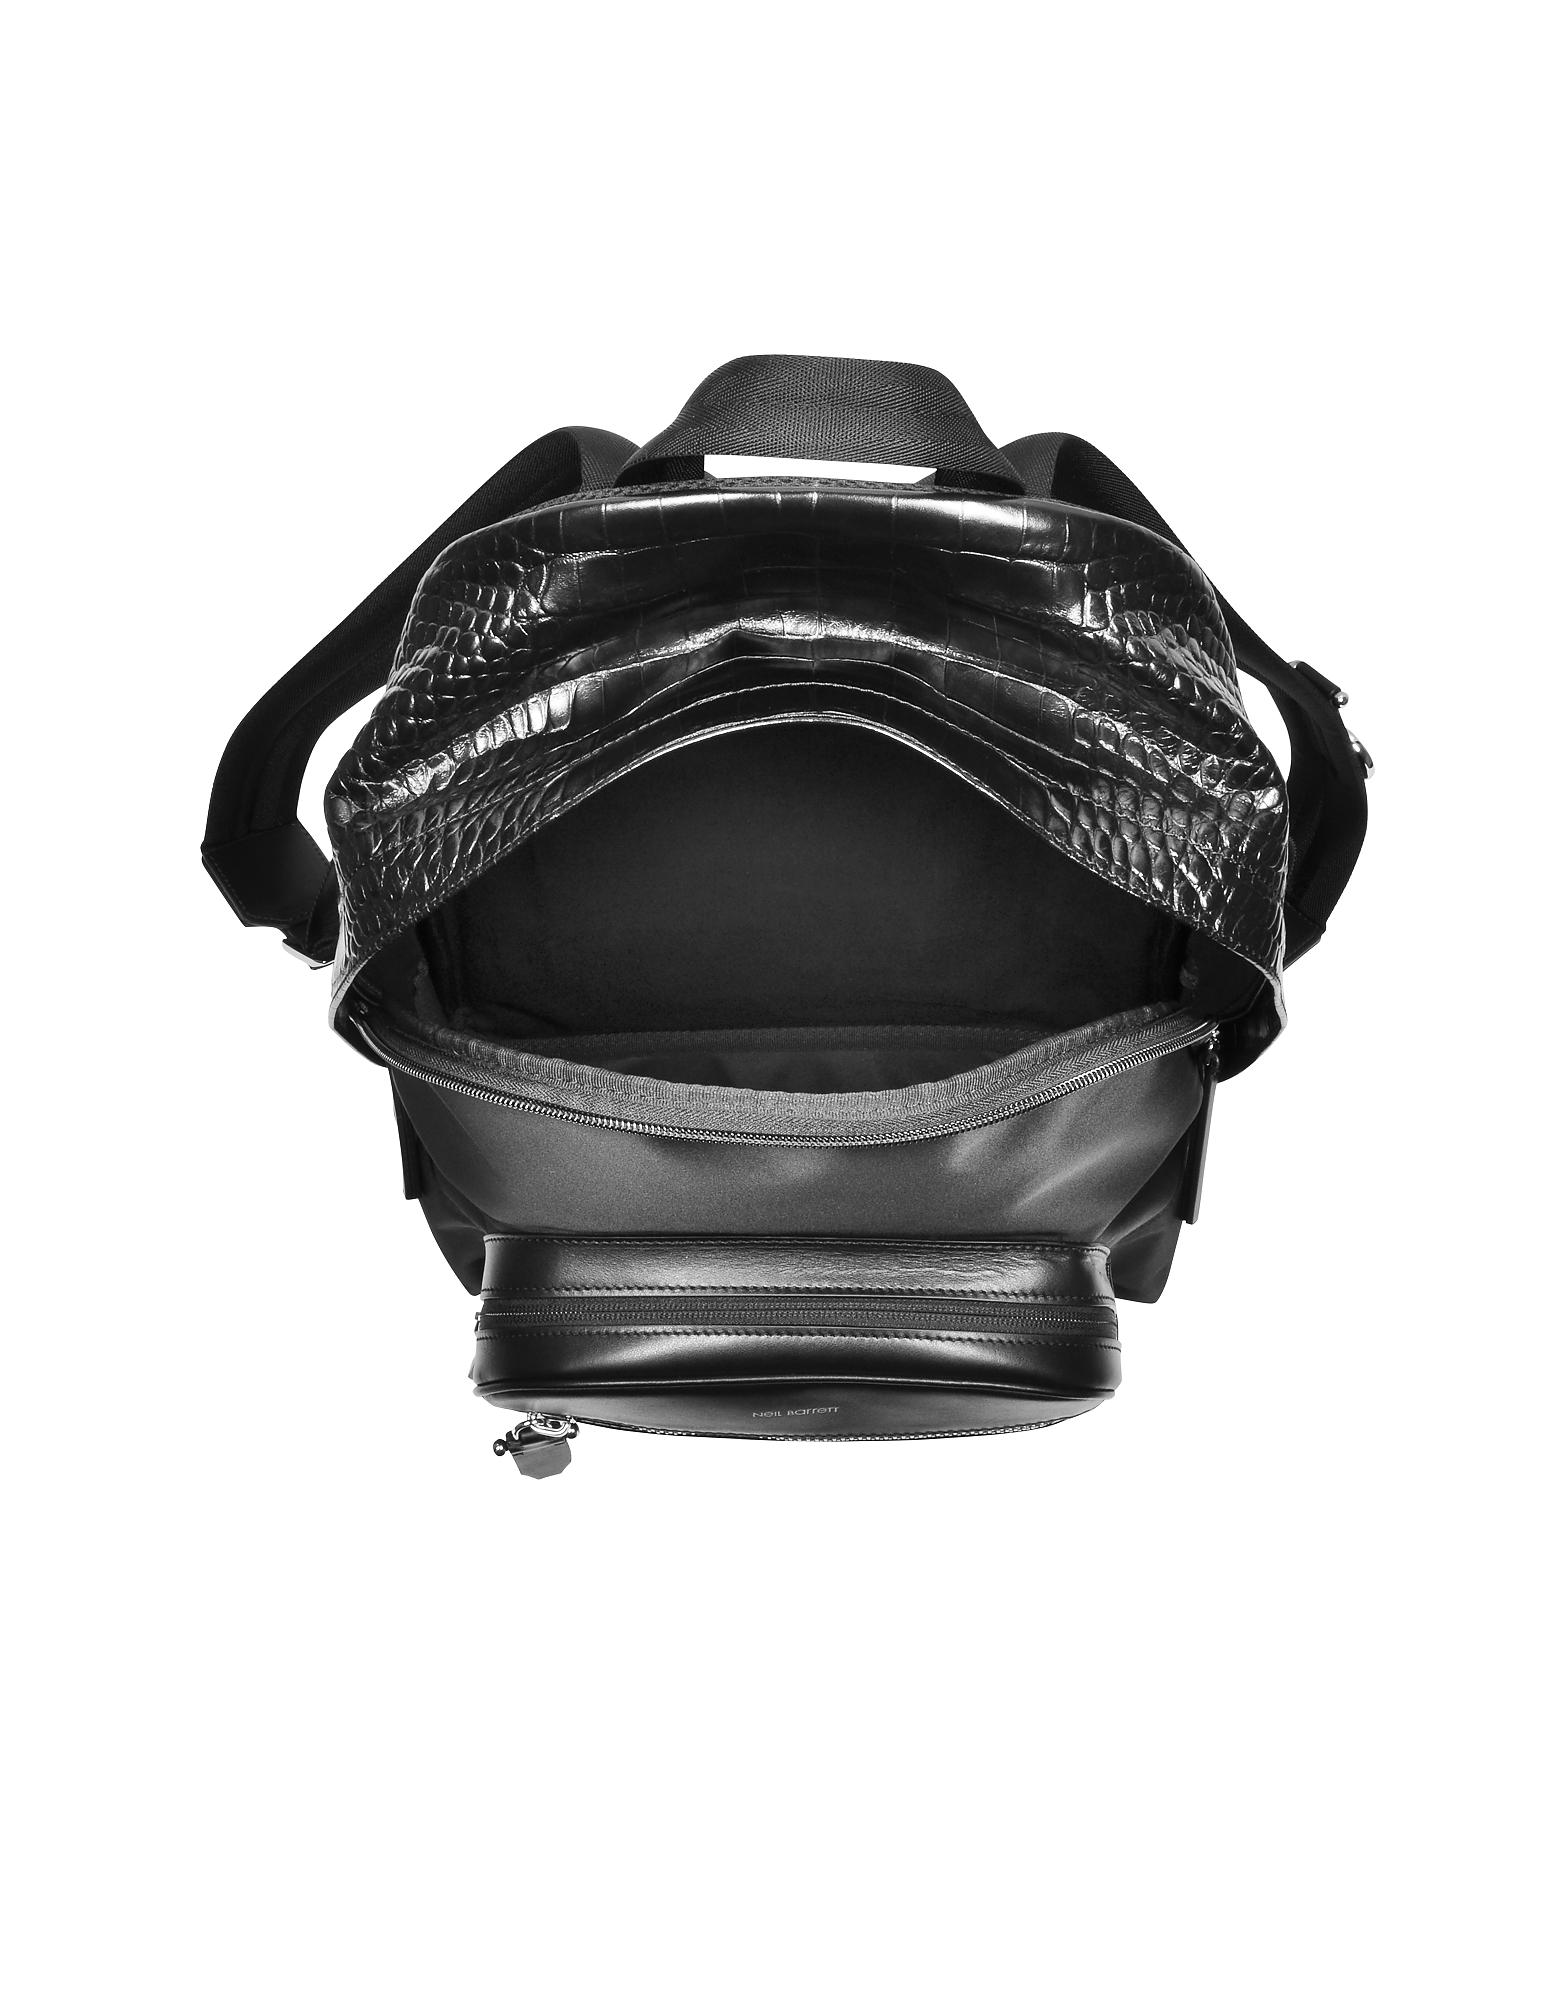 d9762d41b5 Lyst - Neil Barrett Black Embossed Croco Leather And Nylon Classic ...